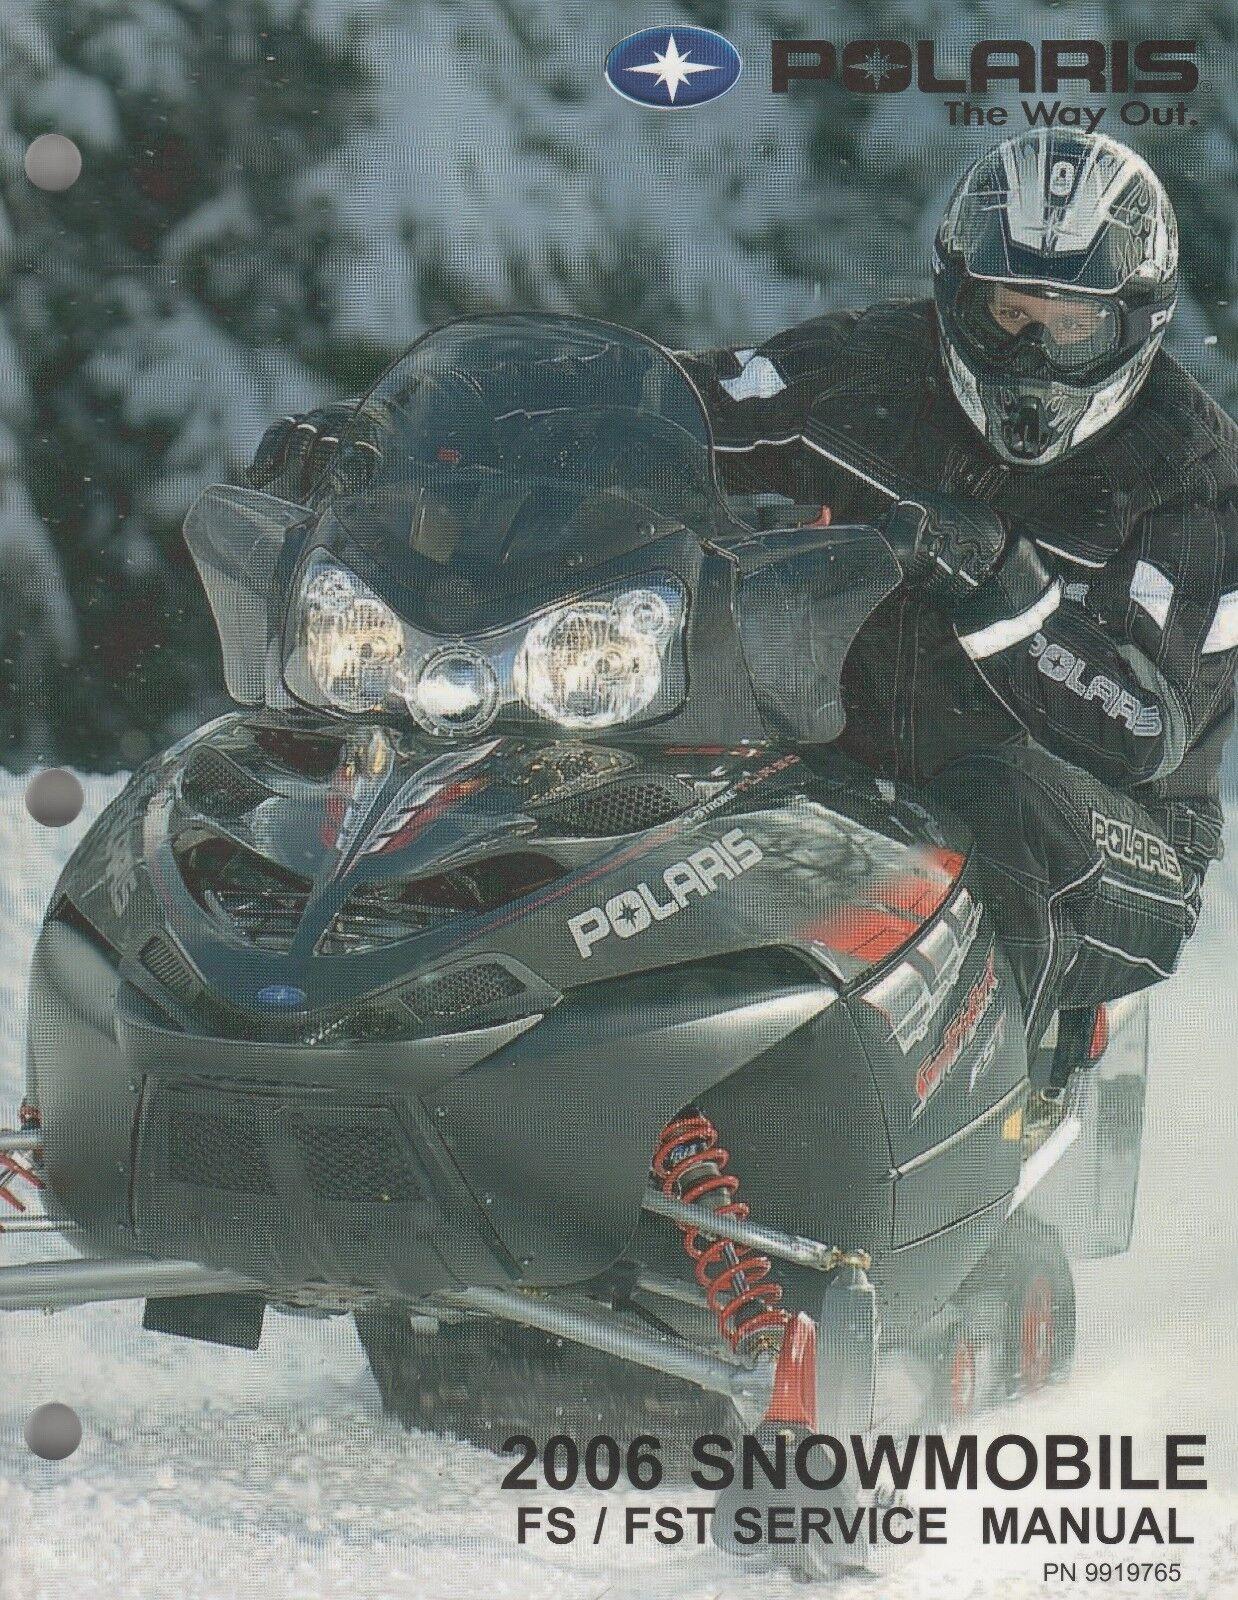 2006 POLARIS SNOWMOBILE FS & FST SERVICE MANUAL 9919765 (792)